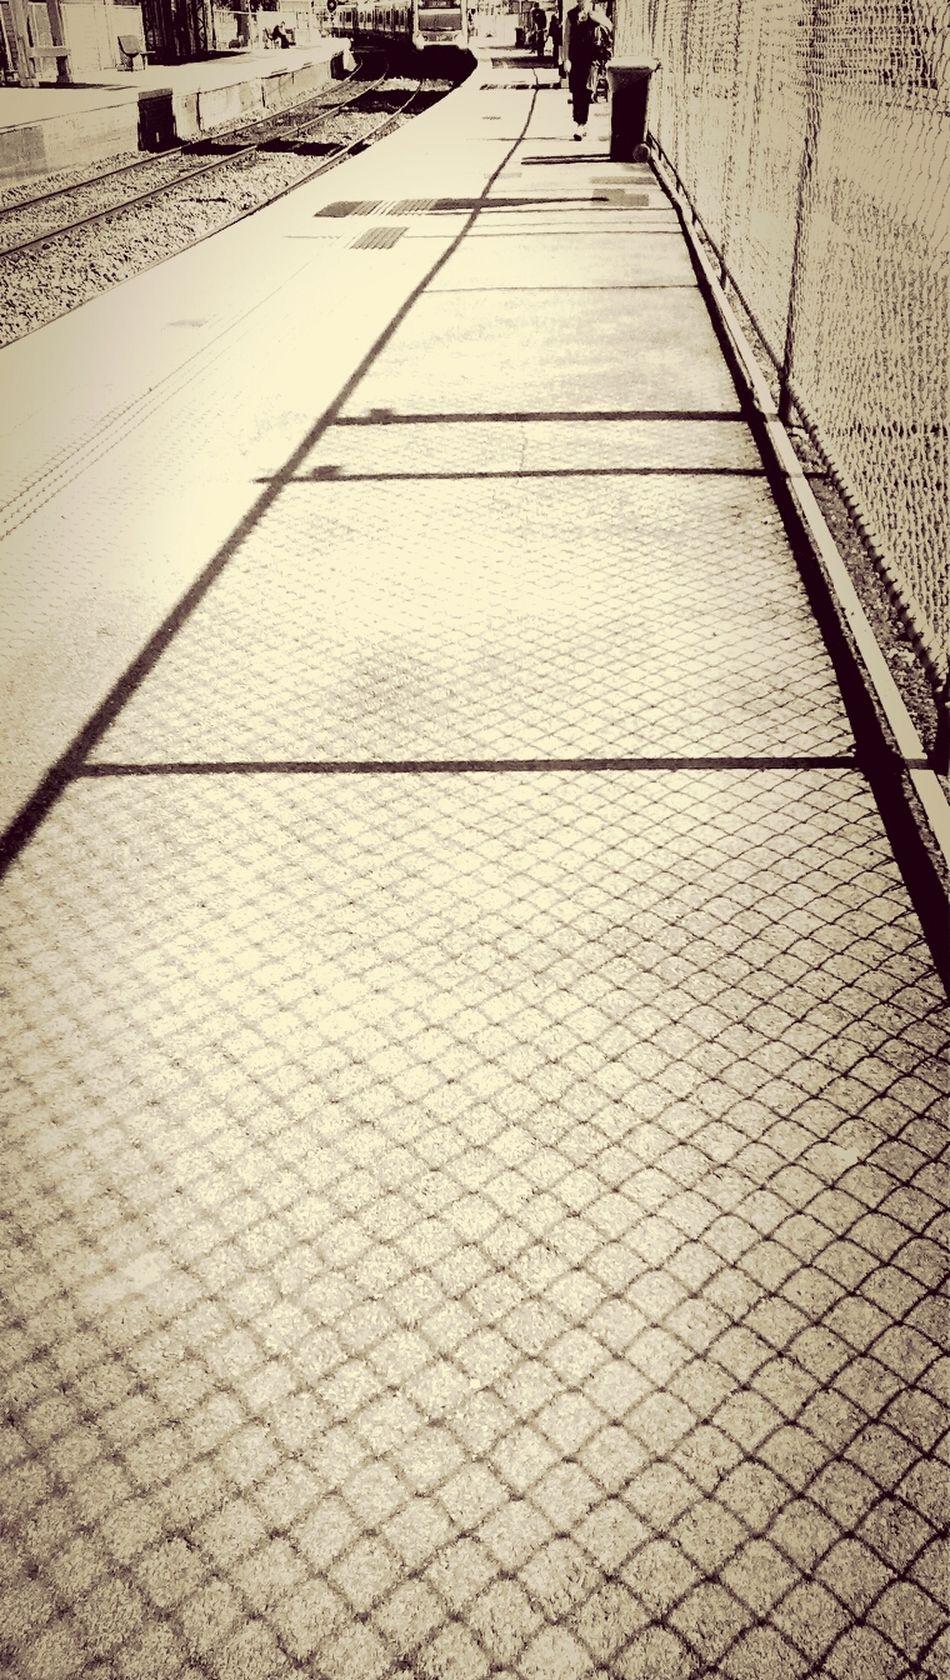 fencing Walking Around HTC One Edit Public Transportation